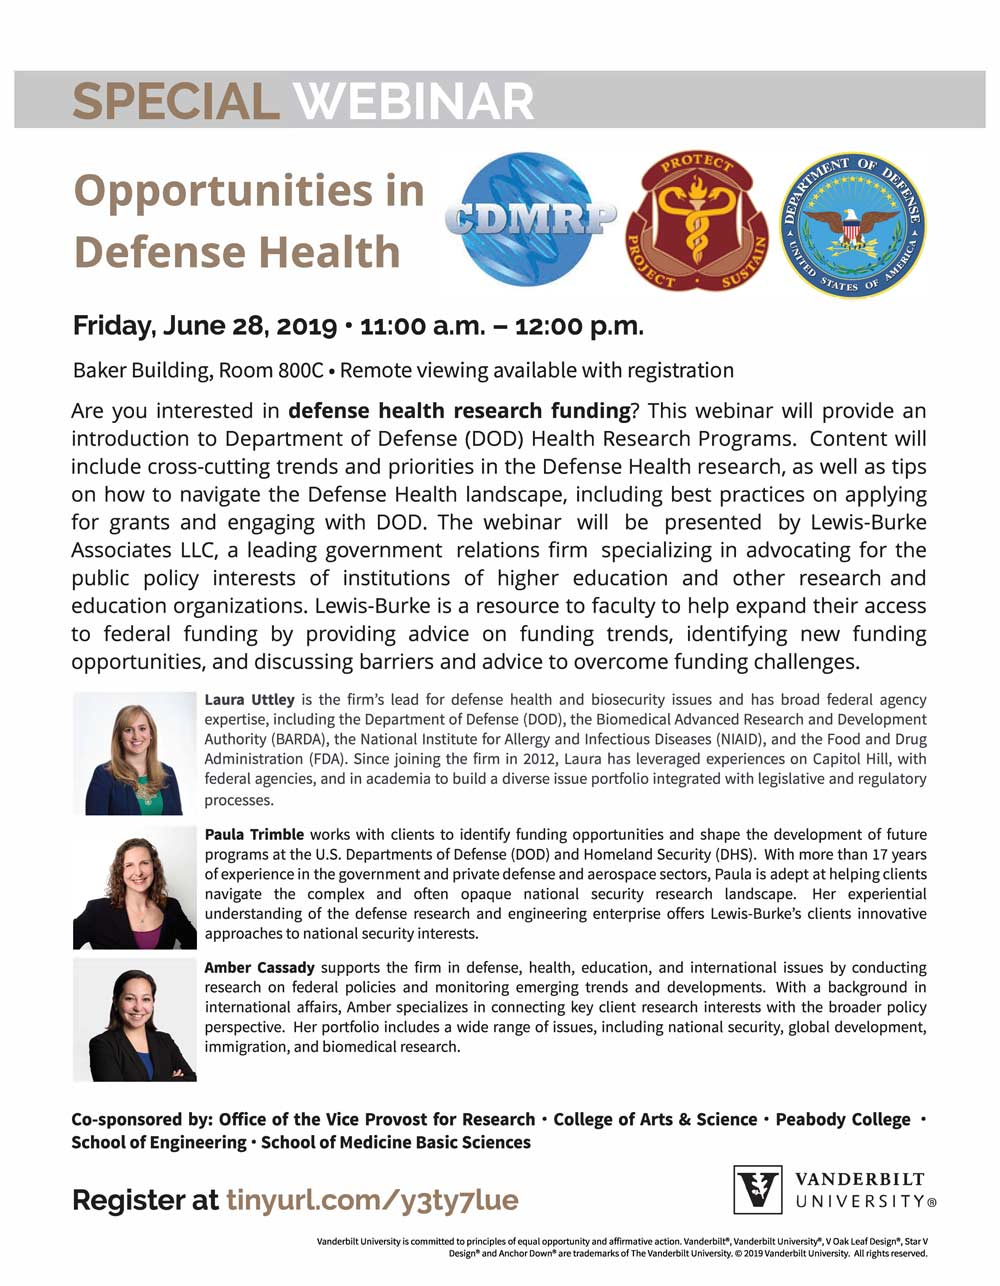 Webinar: Opportunities in Defense Health